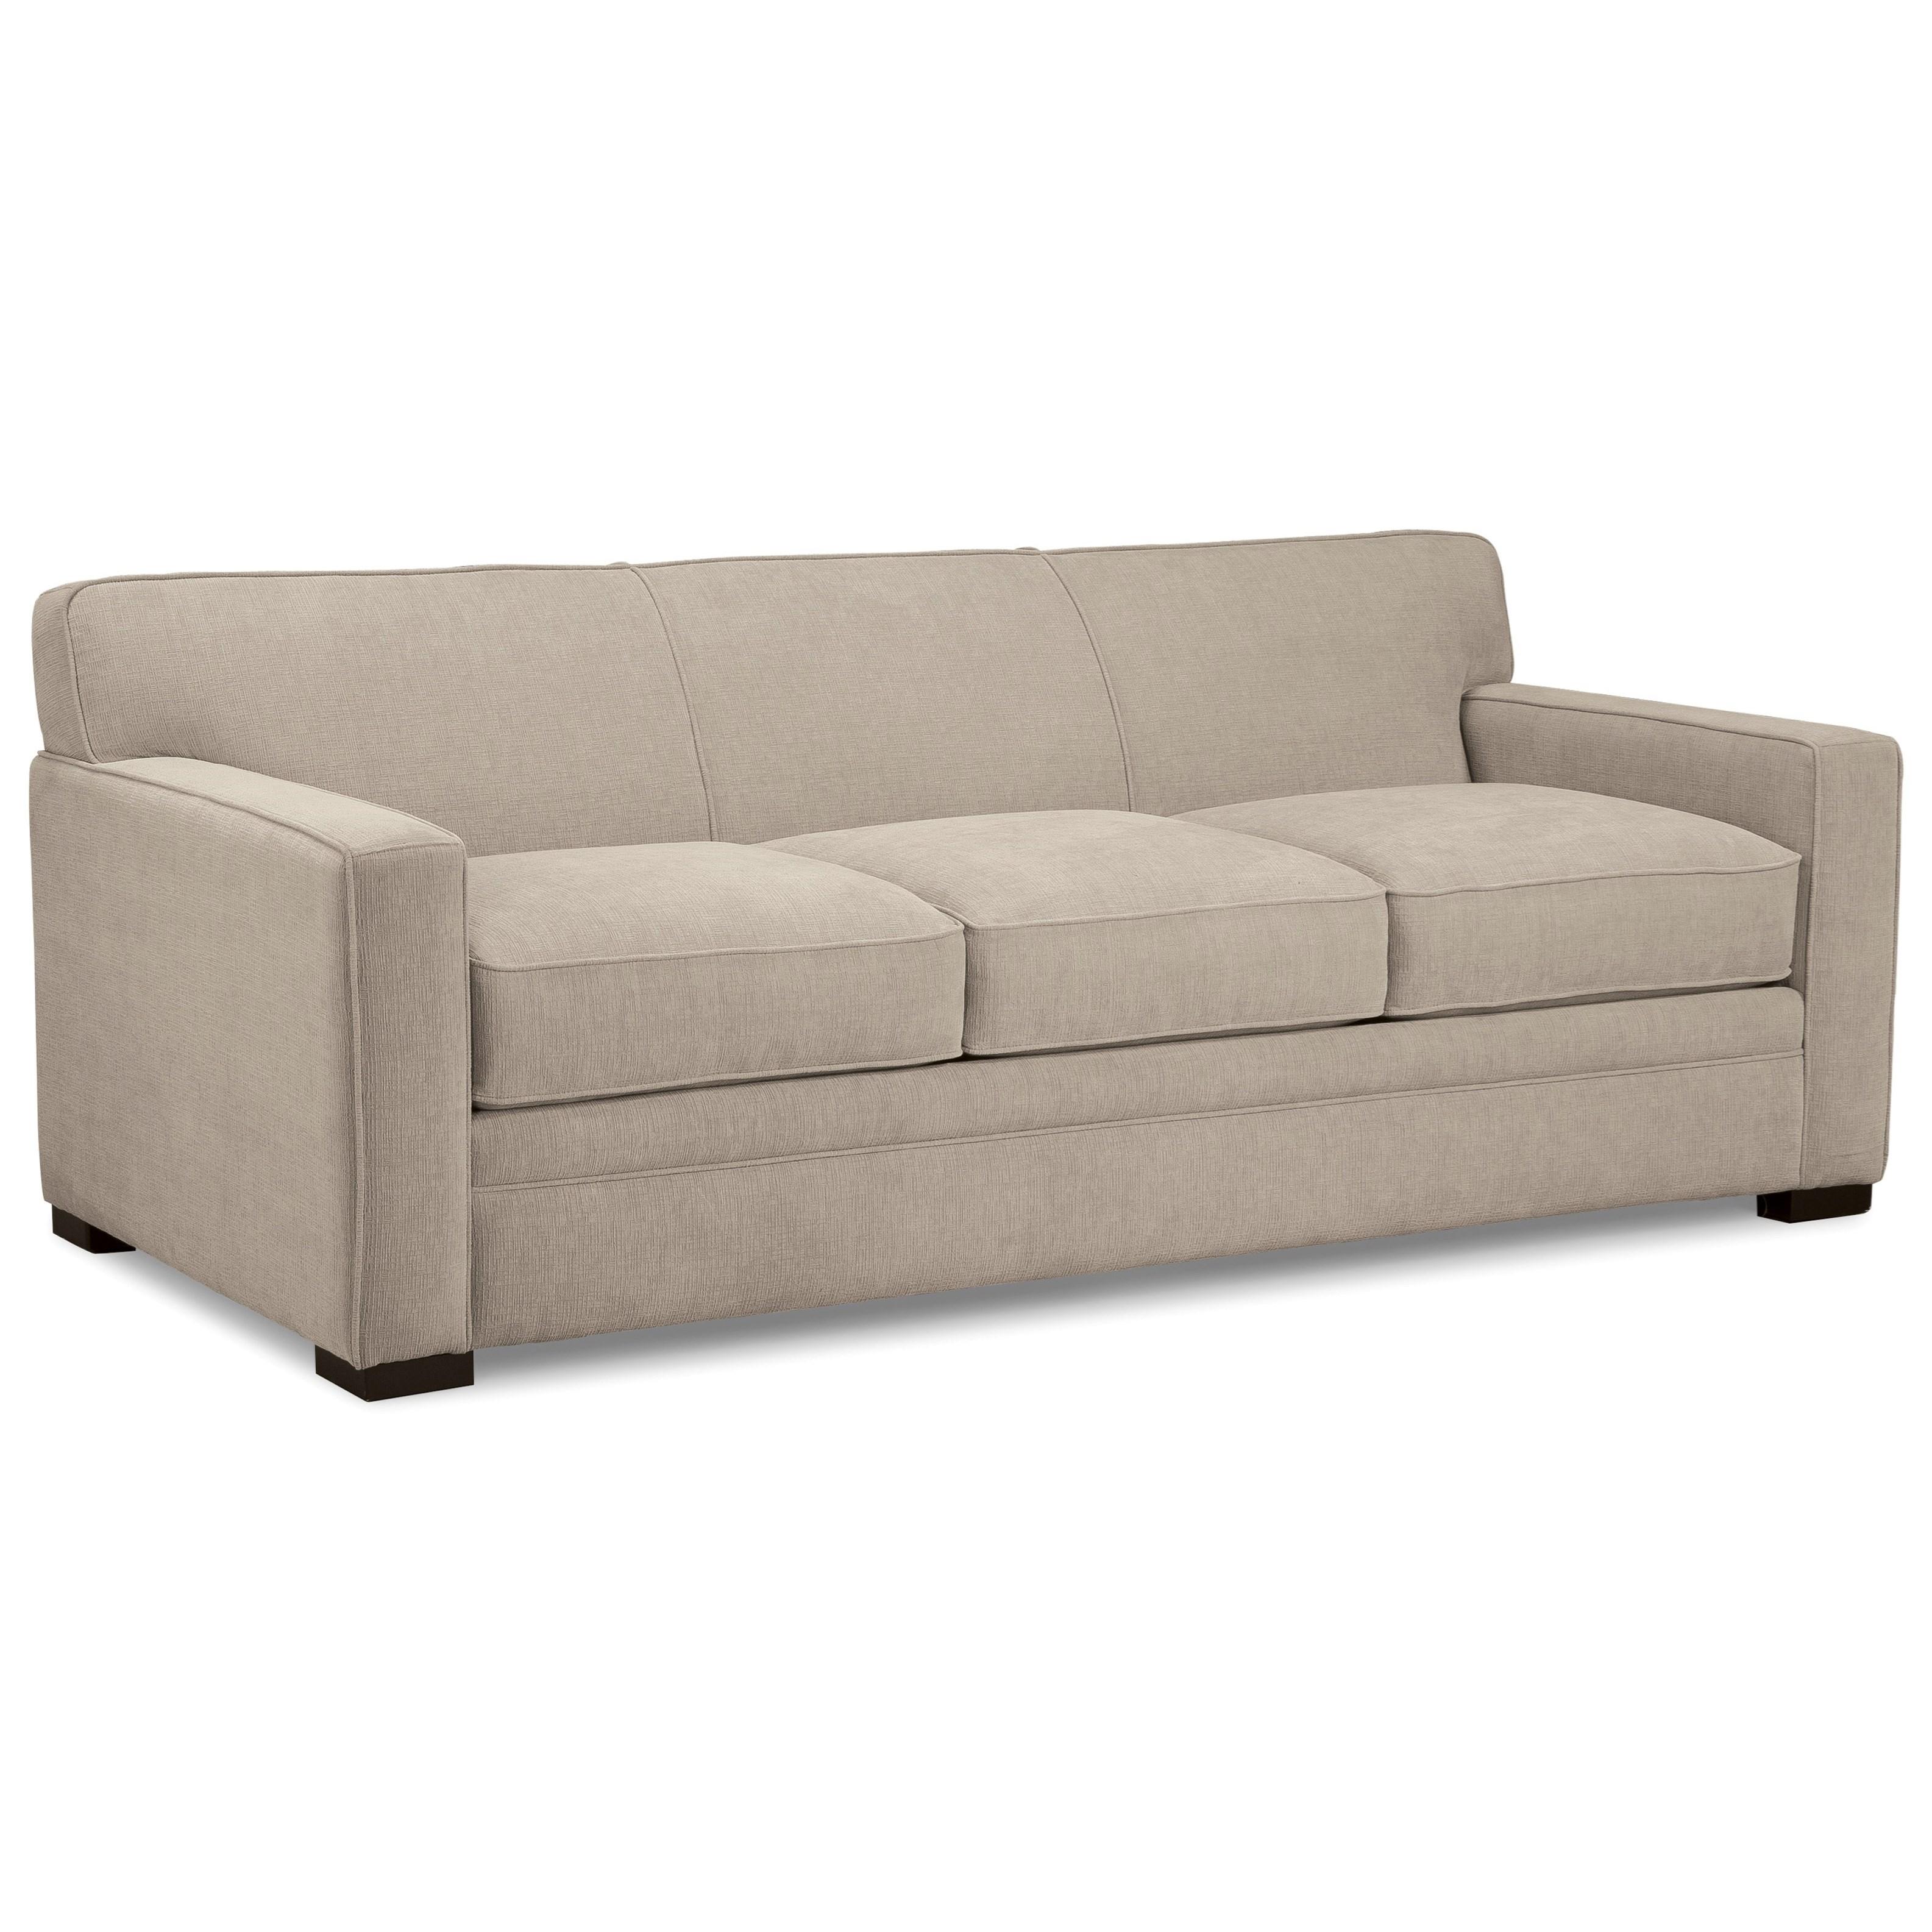 Jonathan Louis Sleepy Casual Queen Sleeper Sofa with Track Arms